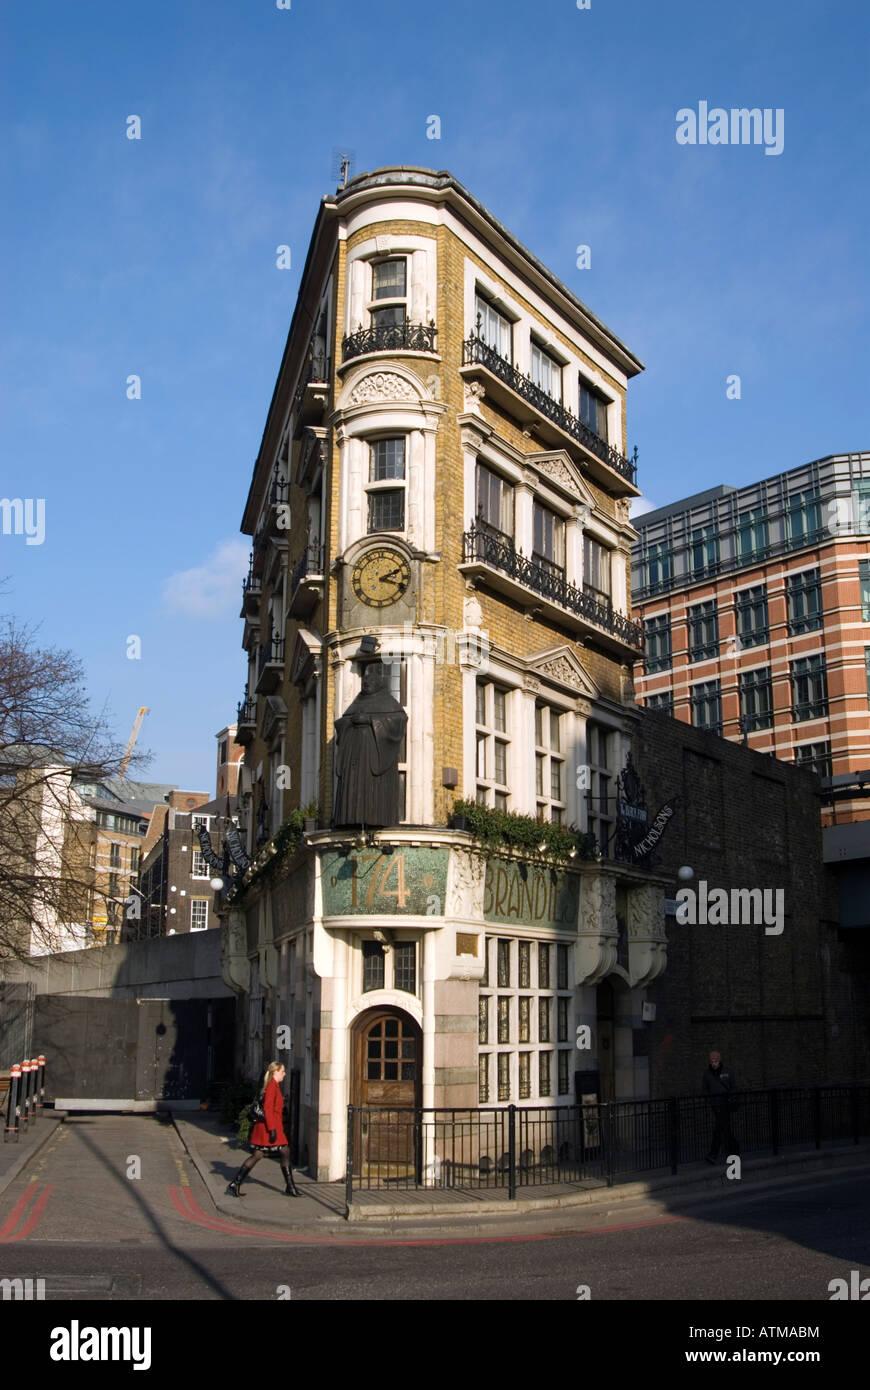 The Black Friar pub in Blackfriars London UK - Stock Image